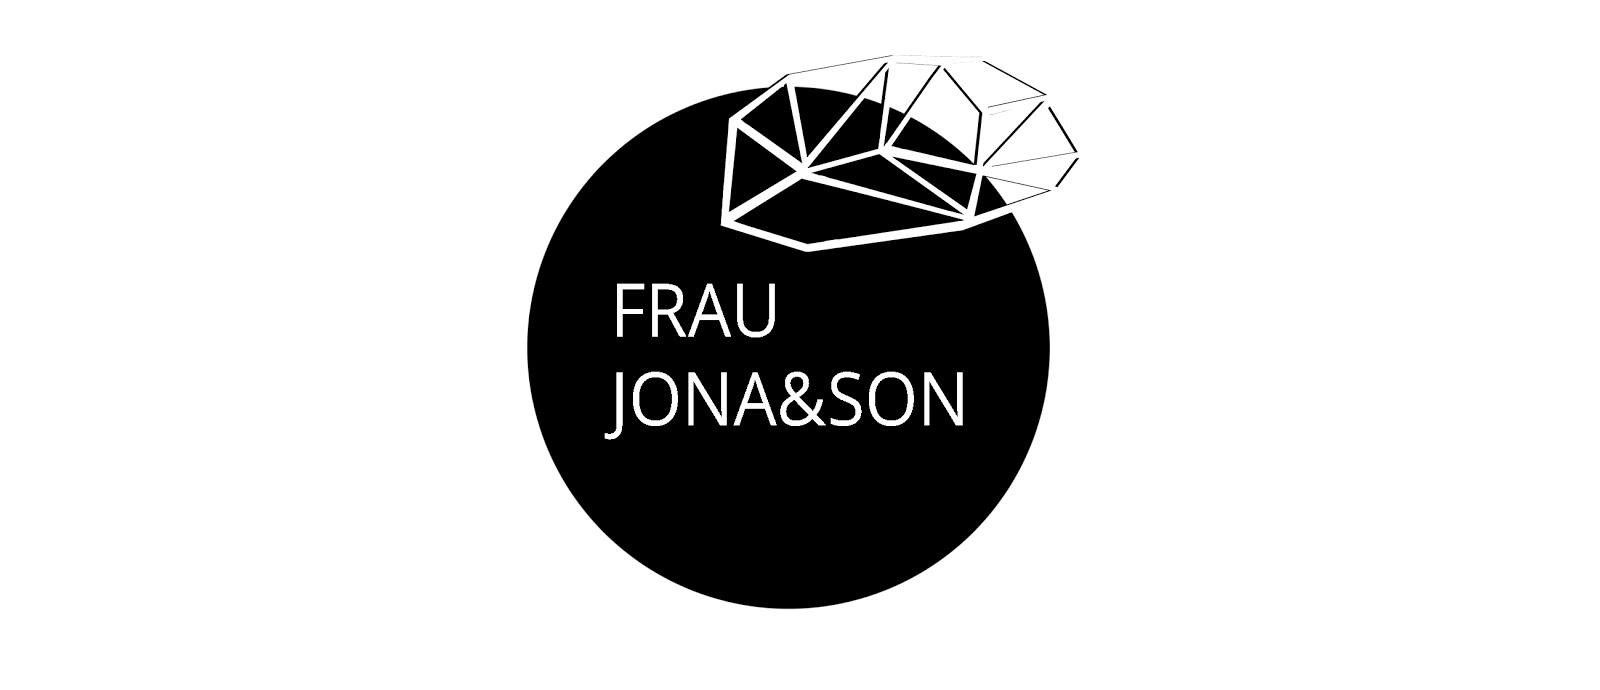 FRAU JONA&SON